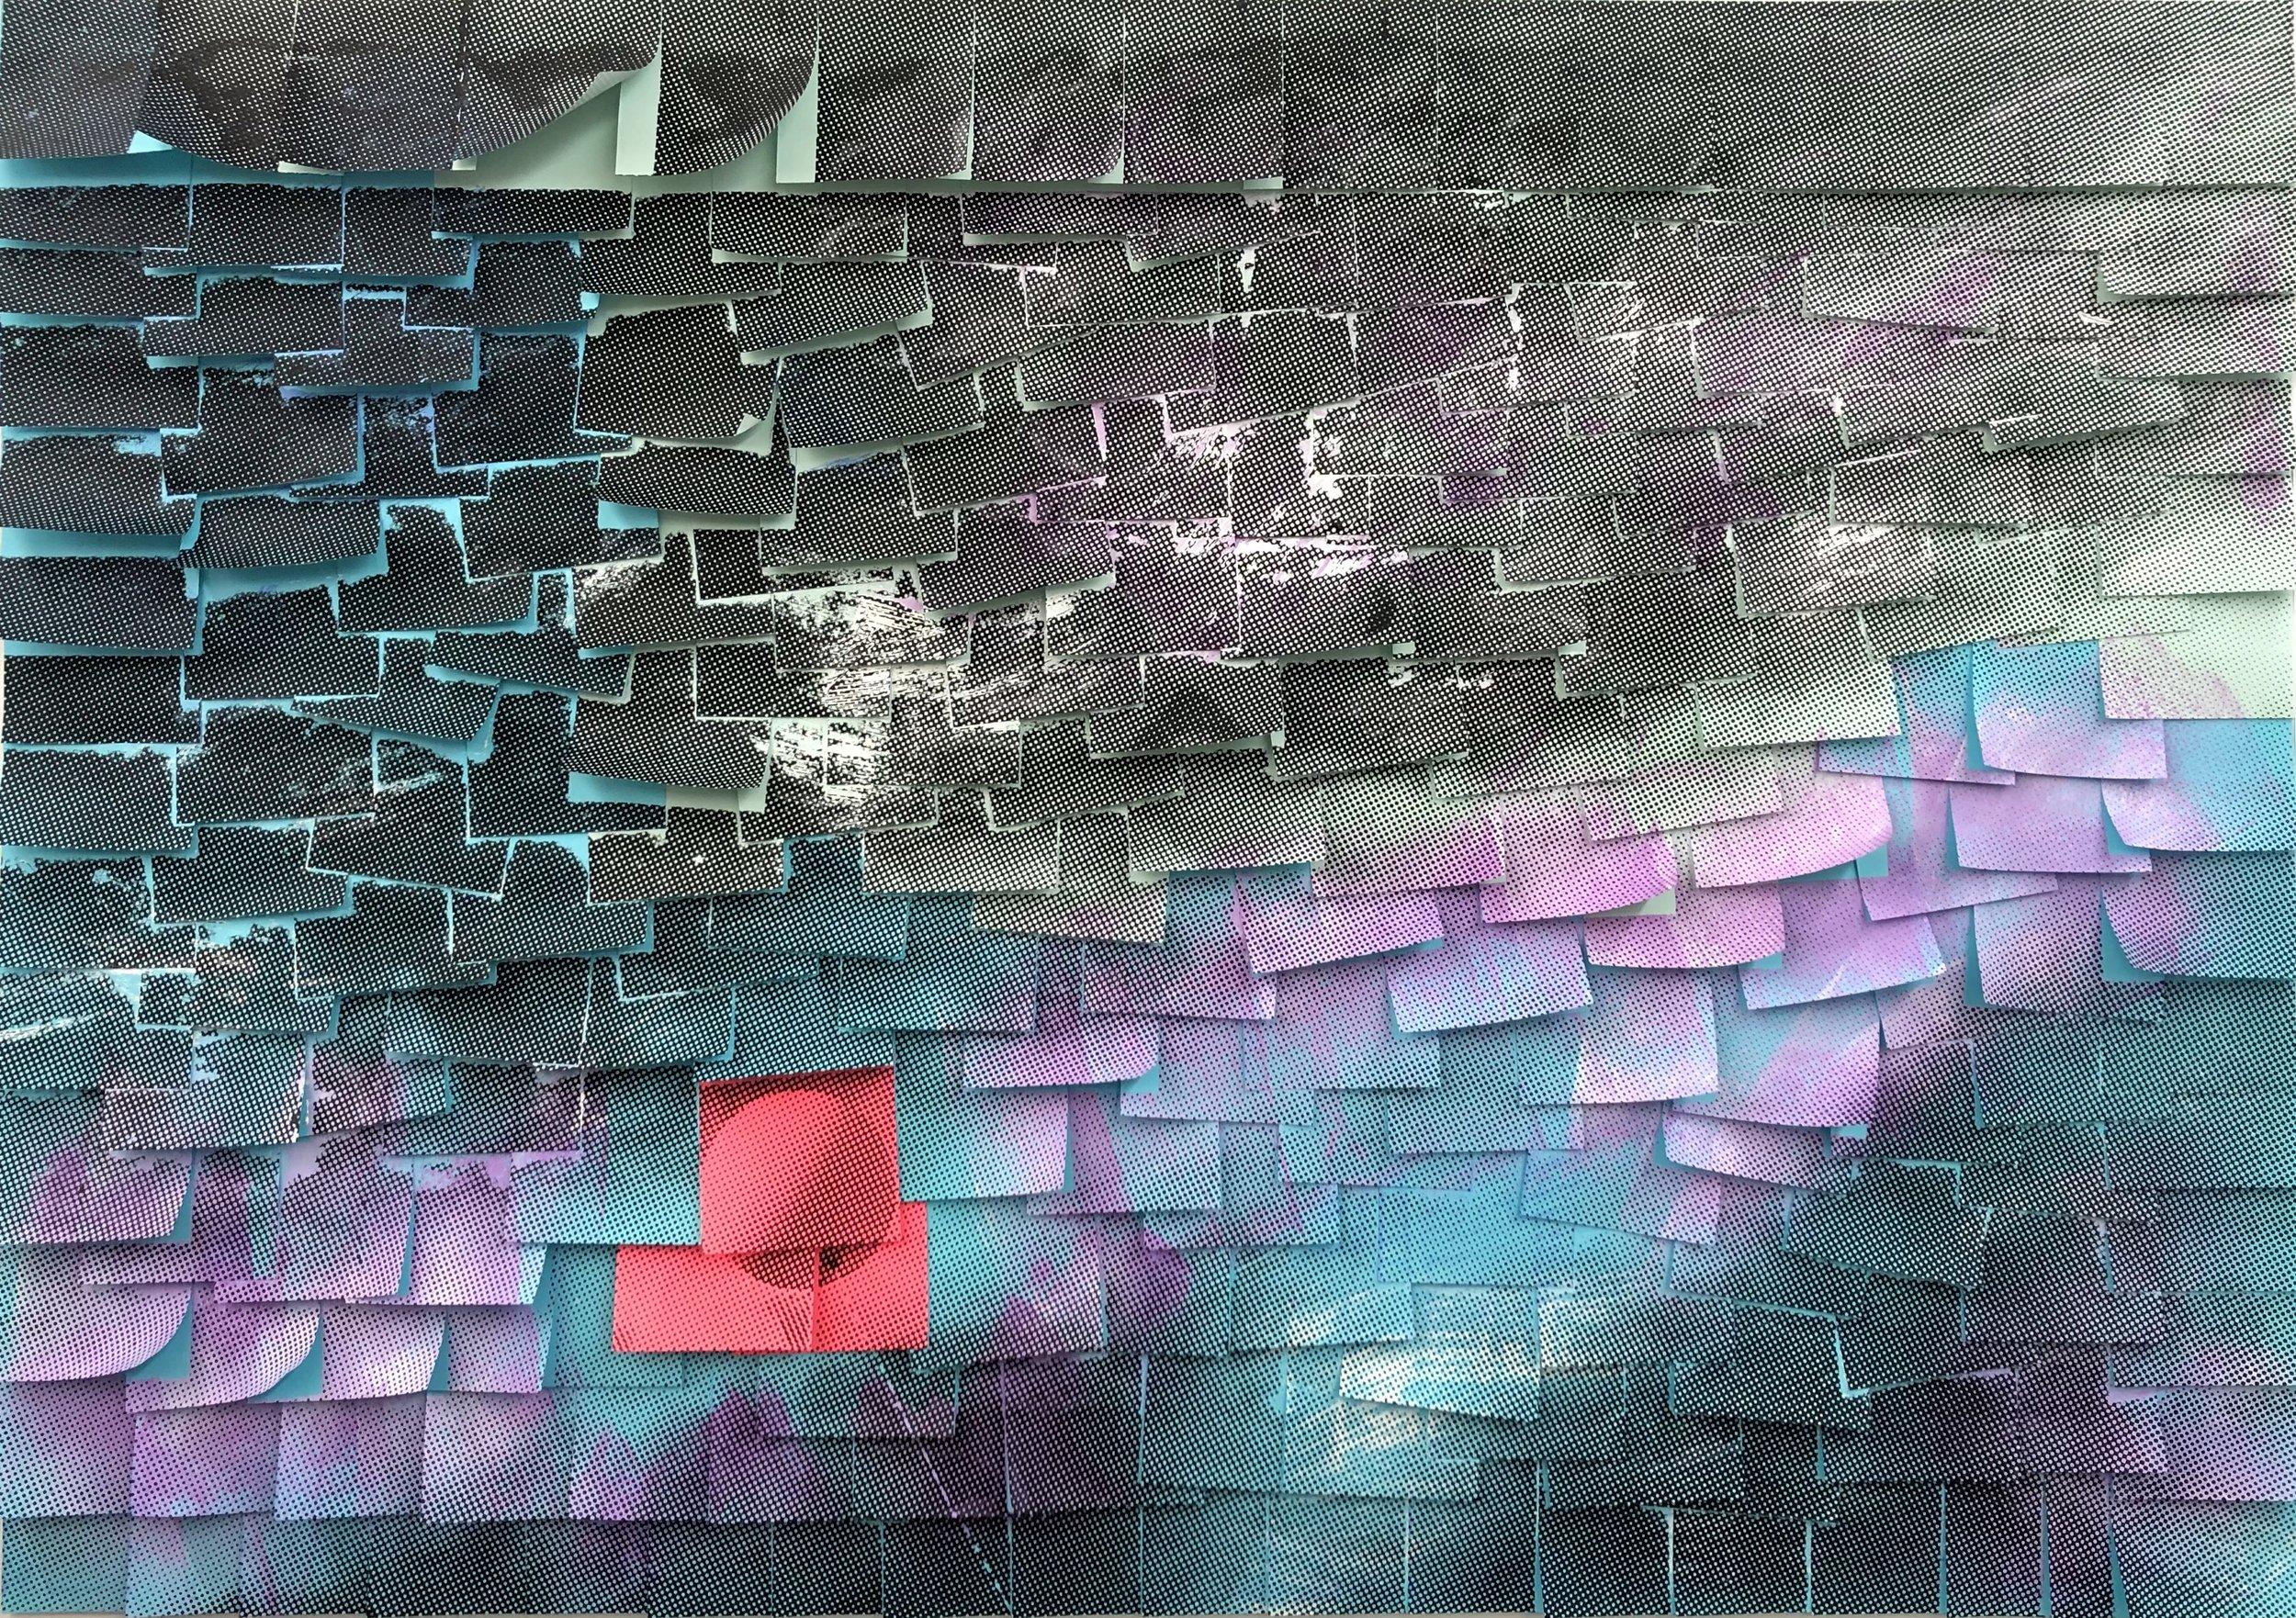 Ardan Özmenoglu,  Joy , 2019, Painting and screen printing on post-it notes, 25 x 35.5 in.